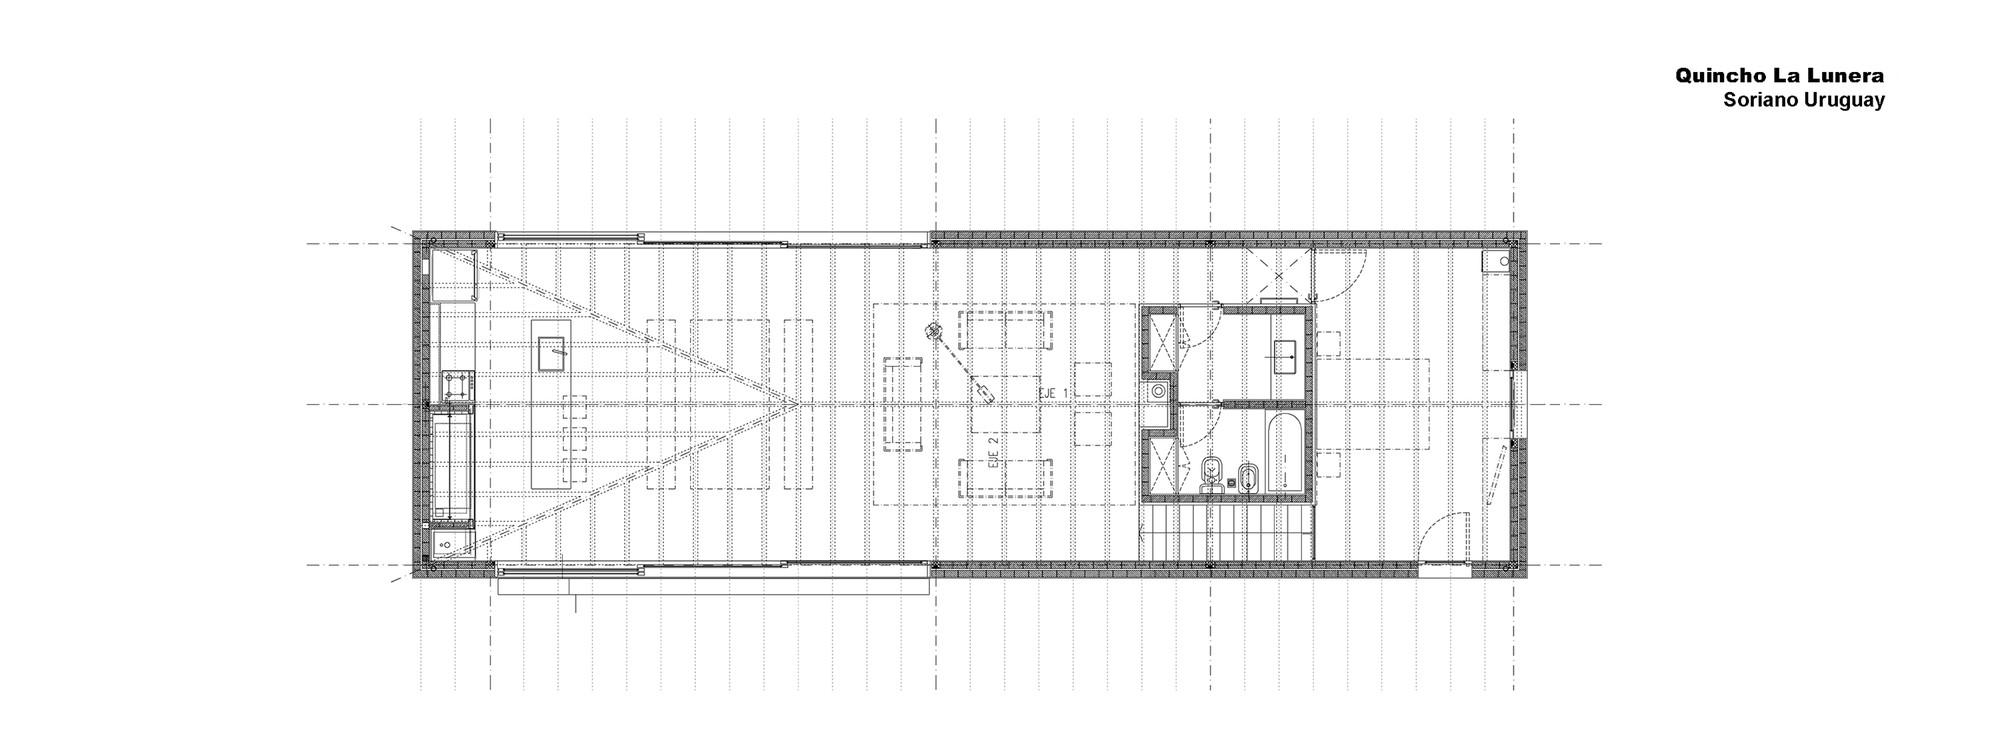 Good Pool House La Lunera,Ground Floor Plan